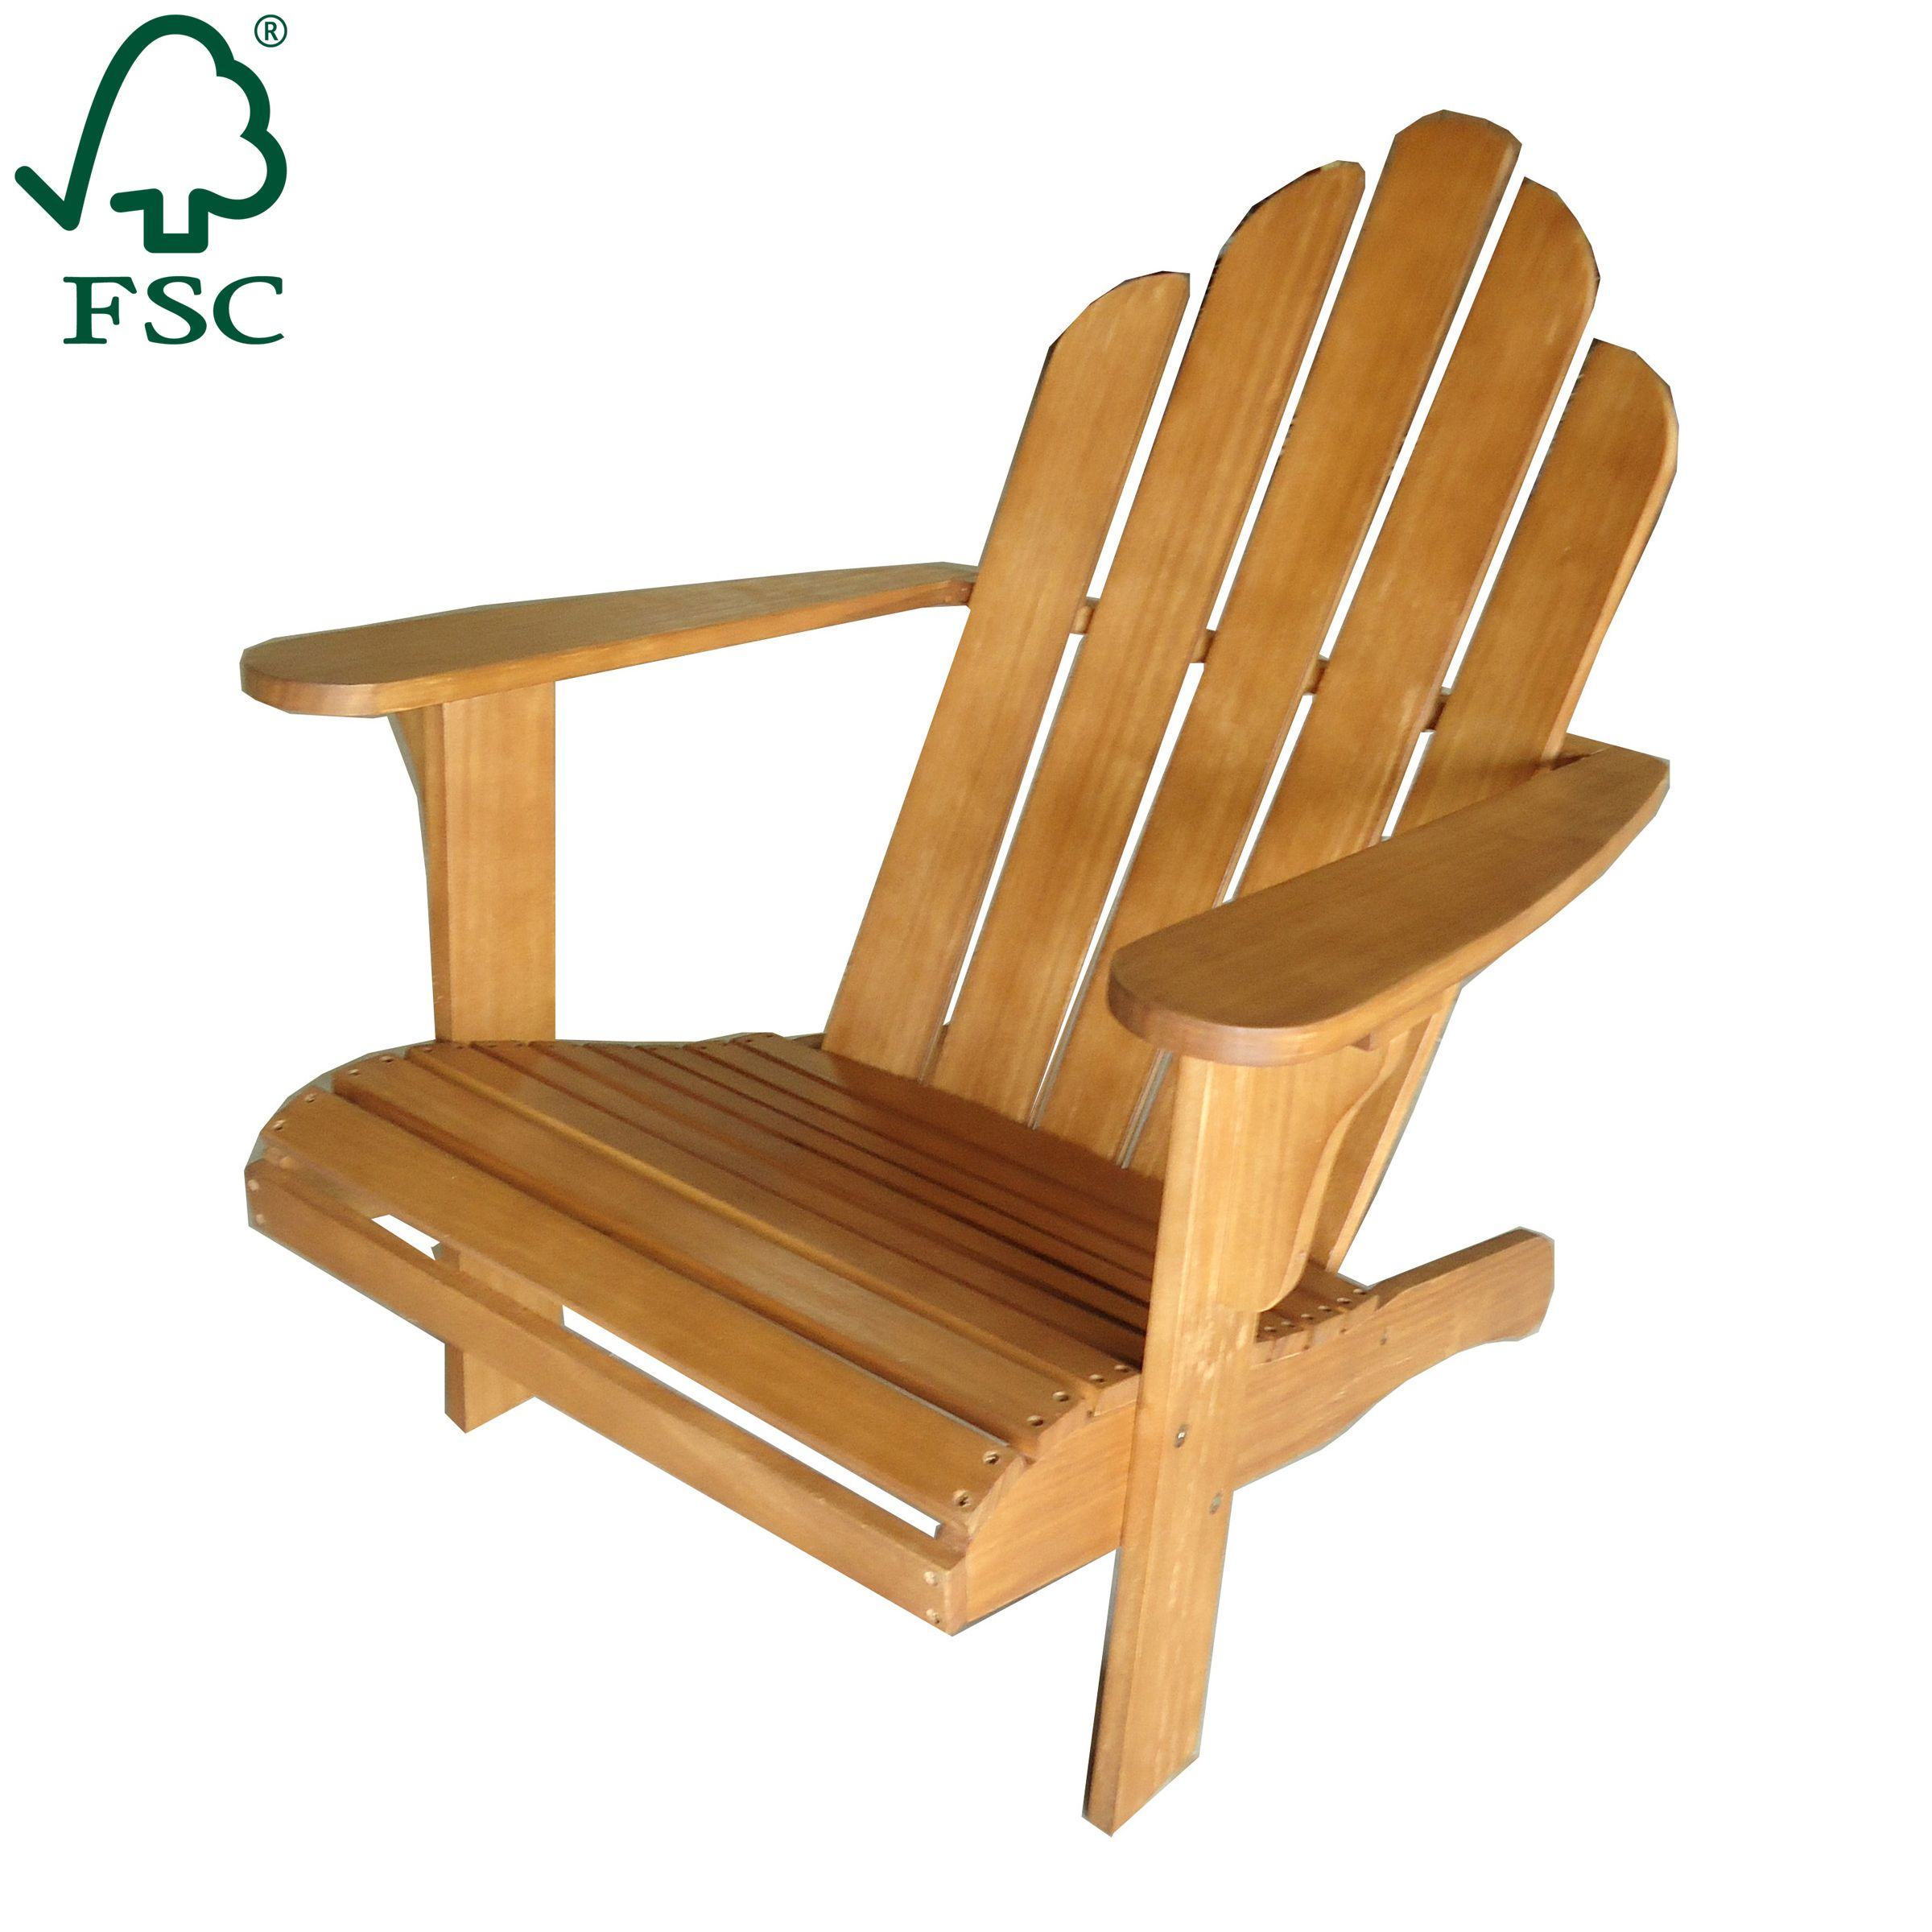 Mimosa Cape Cod Adirondack Timber Chair